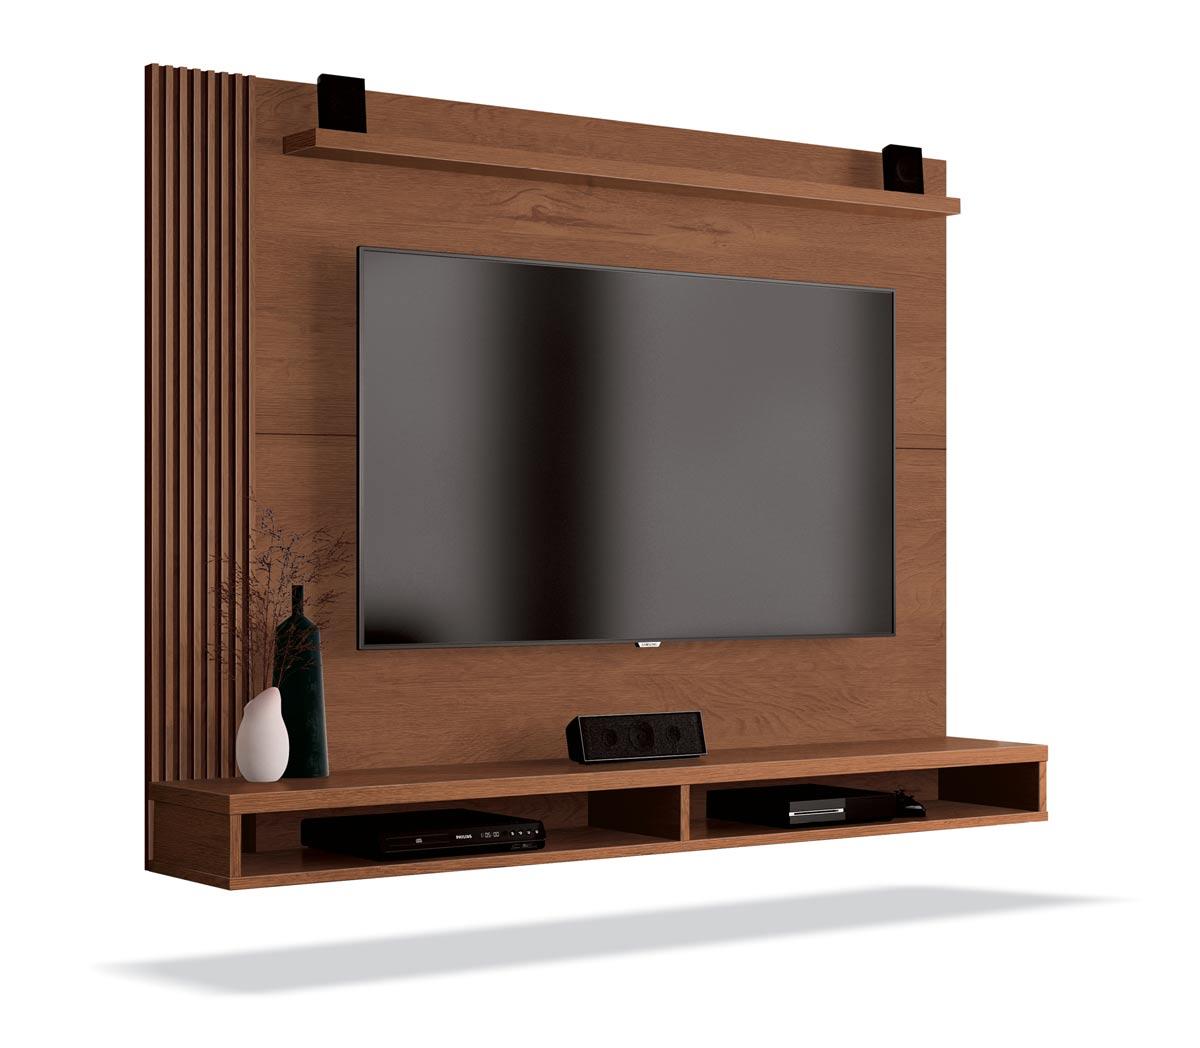 Painel para TV Dijon Naturale - EDN Móveis